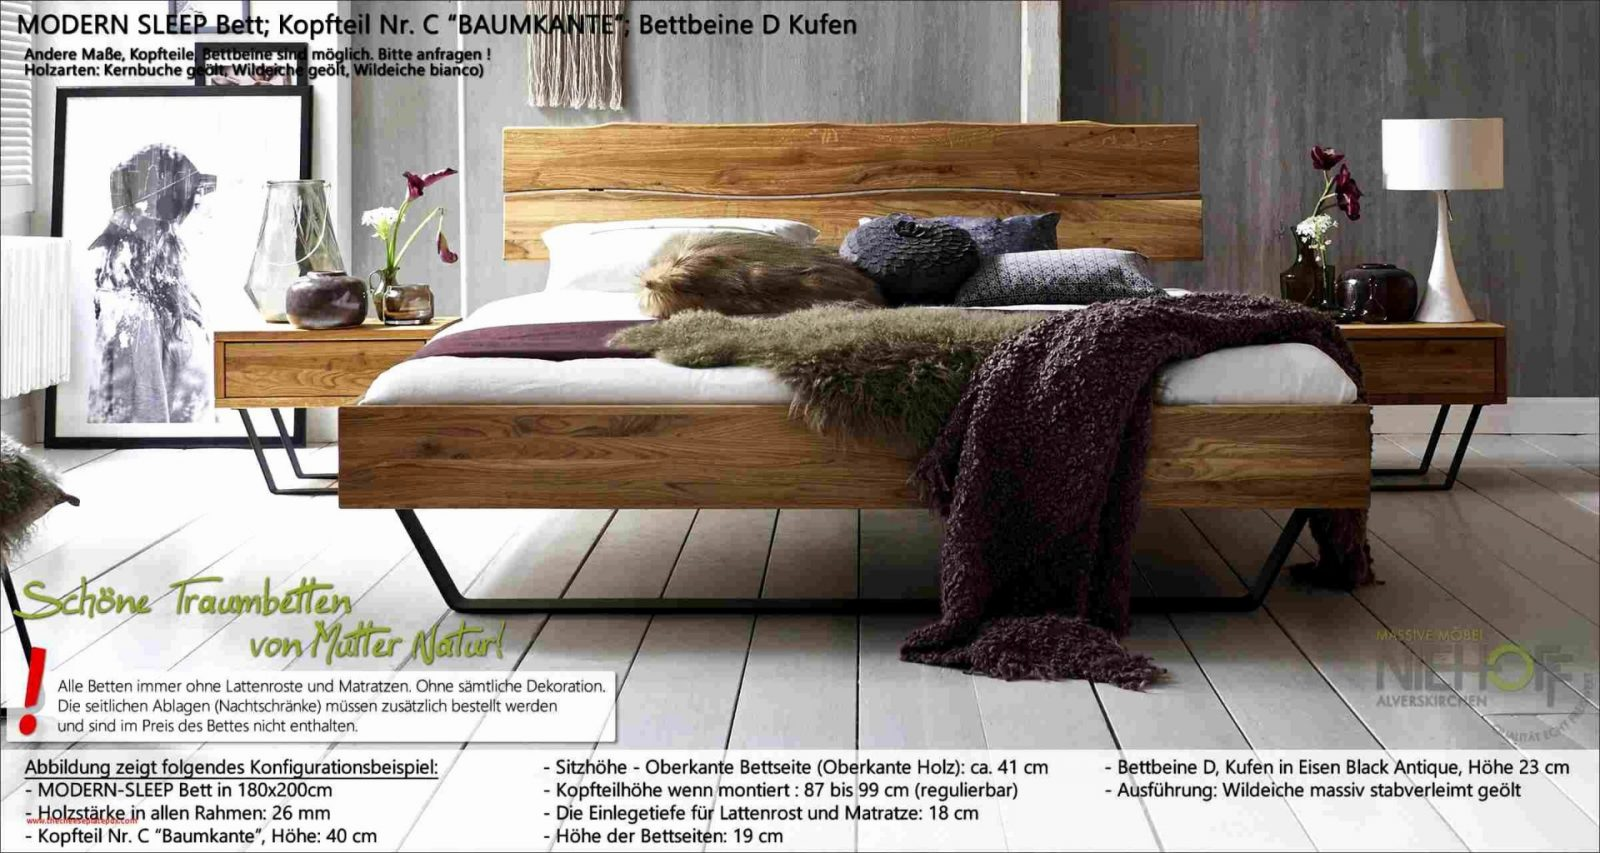 Wasserbett Selber Bauen Fotos Designs Bett Selber Bauen Holz von Wasserbett Kopfteil Selber Bauen Bild